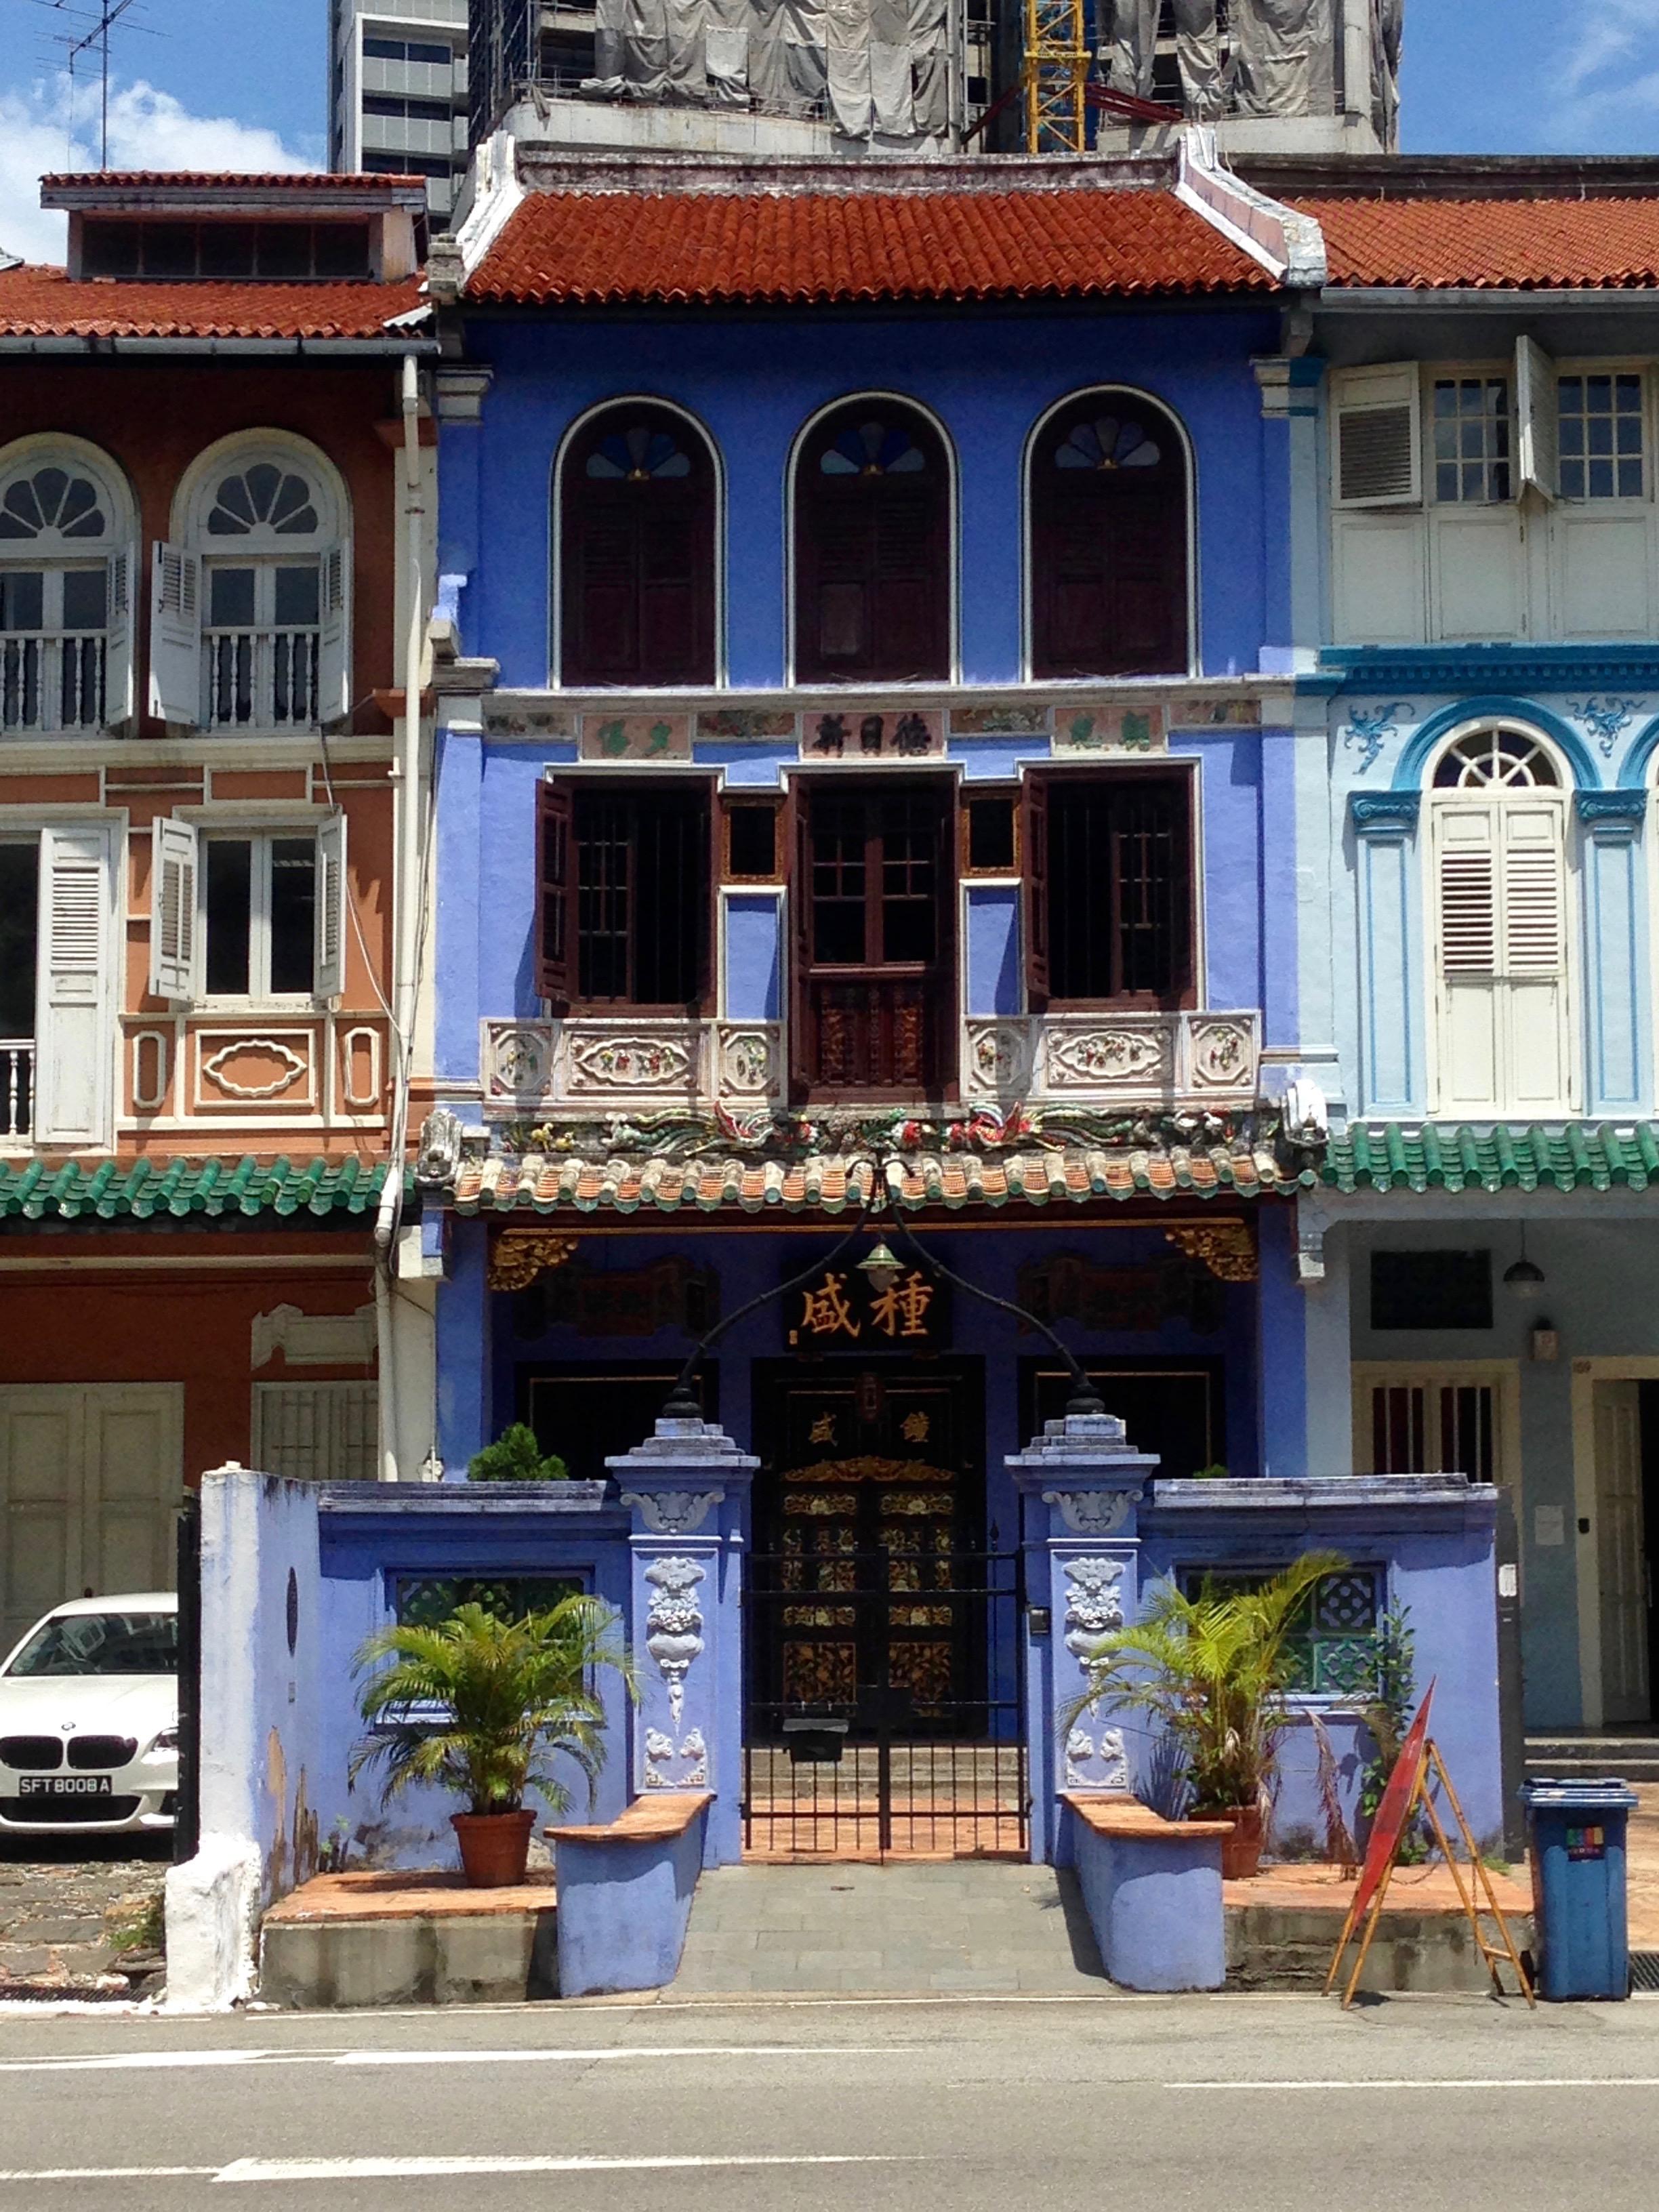 Are House: Chinatown & The CBD, Singapore Chinatown